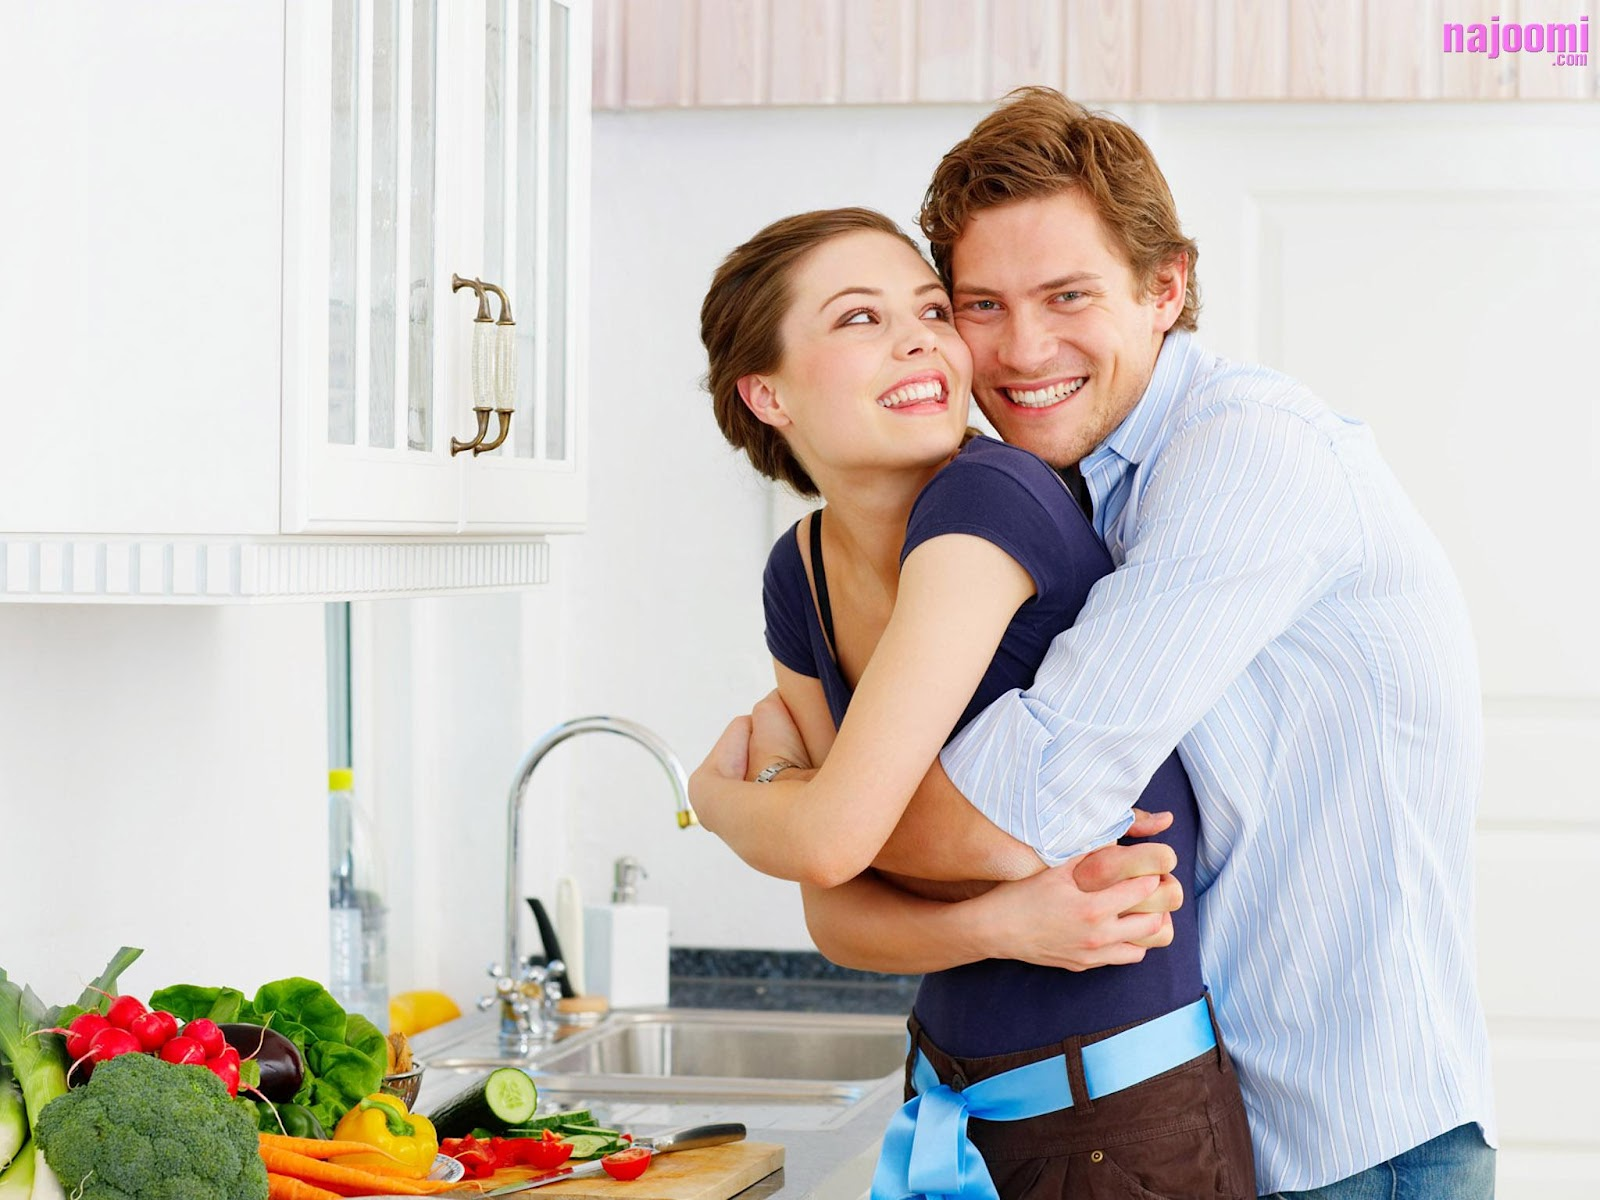 http://2.bp.blogspot.com/-bB6WXV7xPKs/UDZBQW17E6I/AAAAAAAAAvw/z20zTeXaVTA/s1600/Cute-Couple-Loving-nice+hug-warm+hug-romatic+couple-couple+in+sweet+home-www.143loveu.blogspot.in.jpg